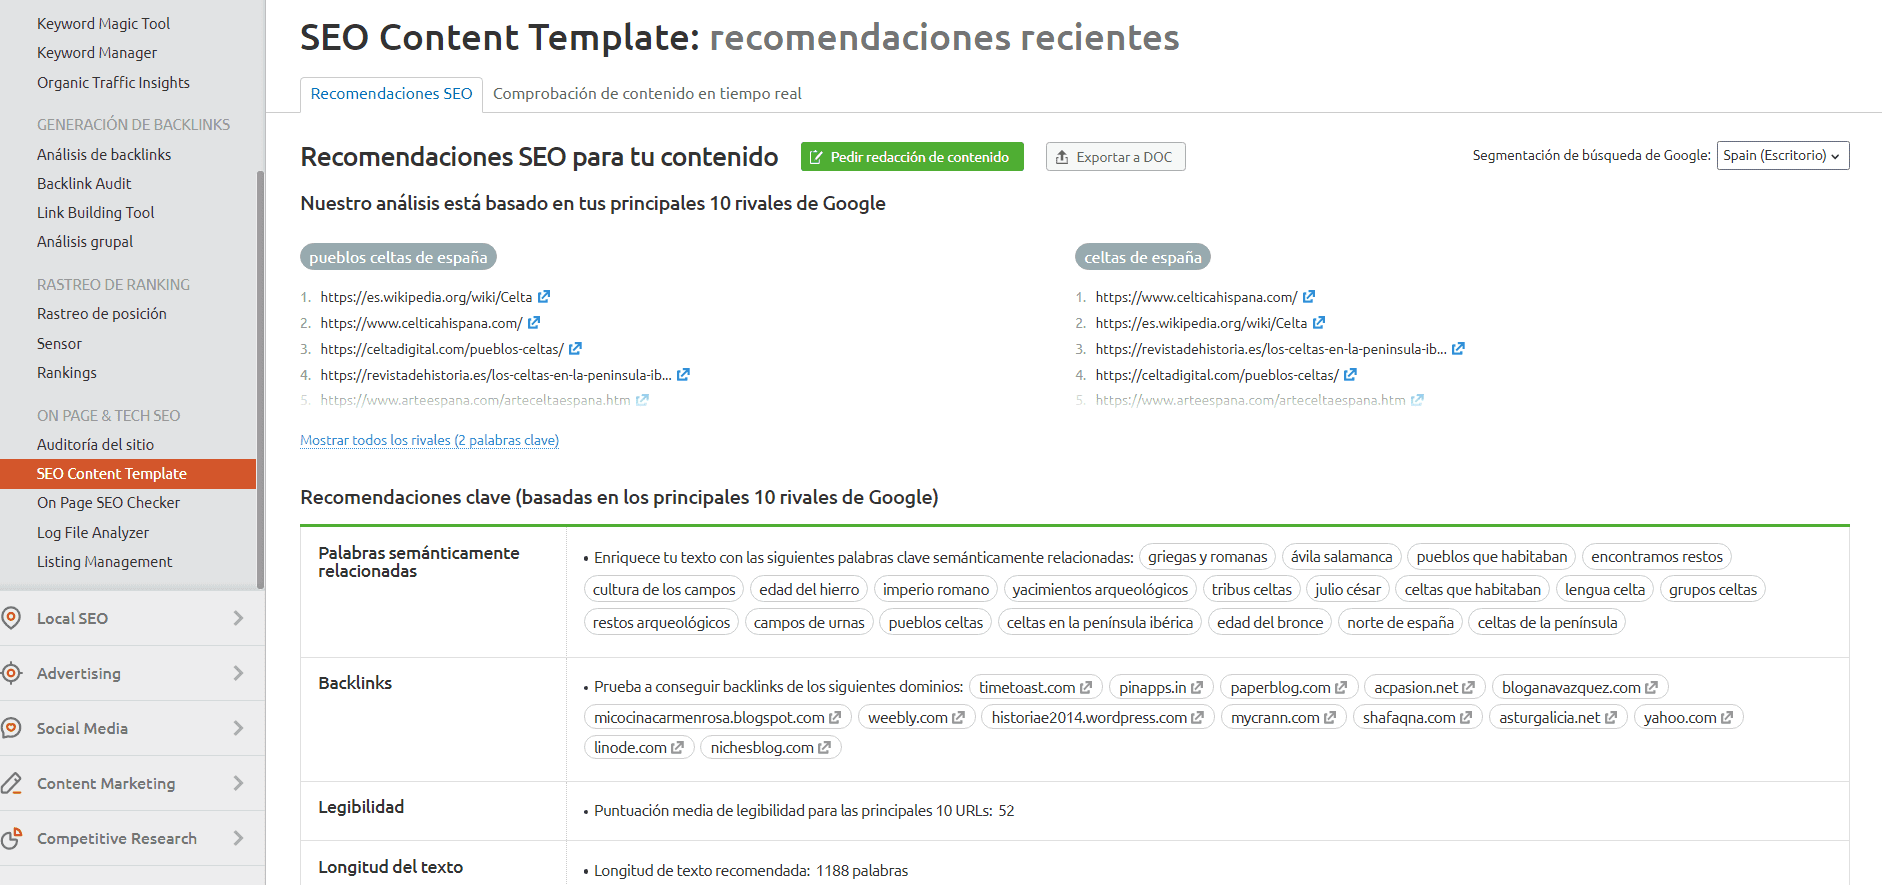 seo content template recomendaciones de contenido